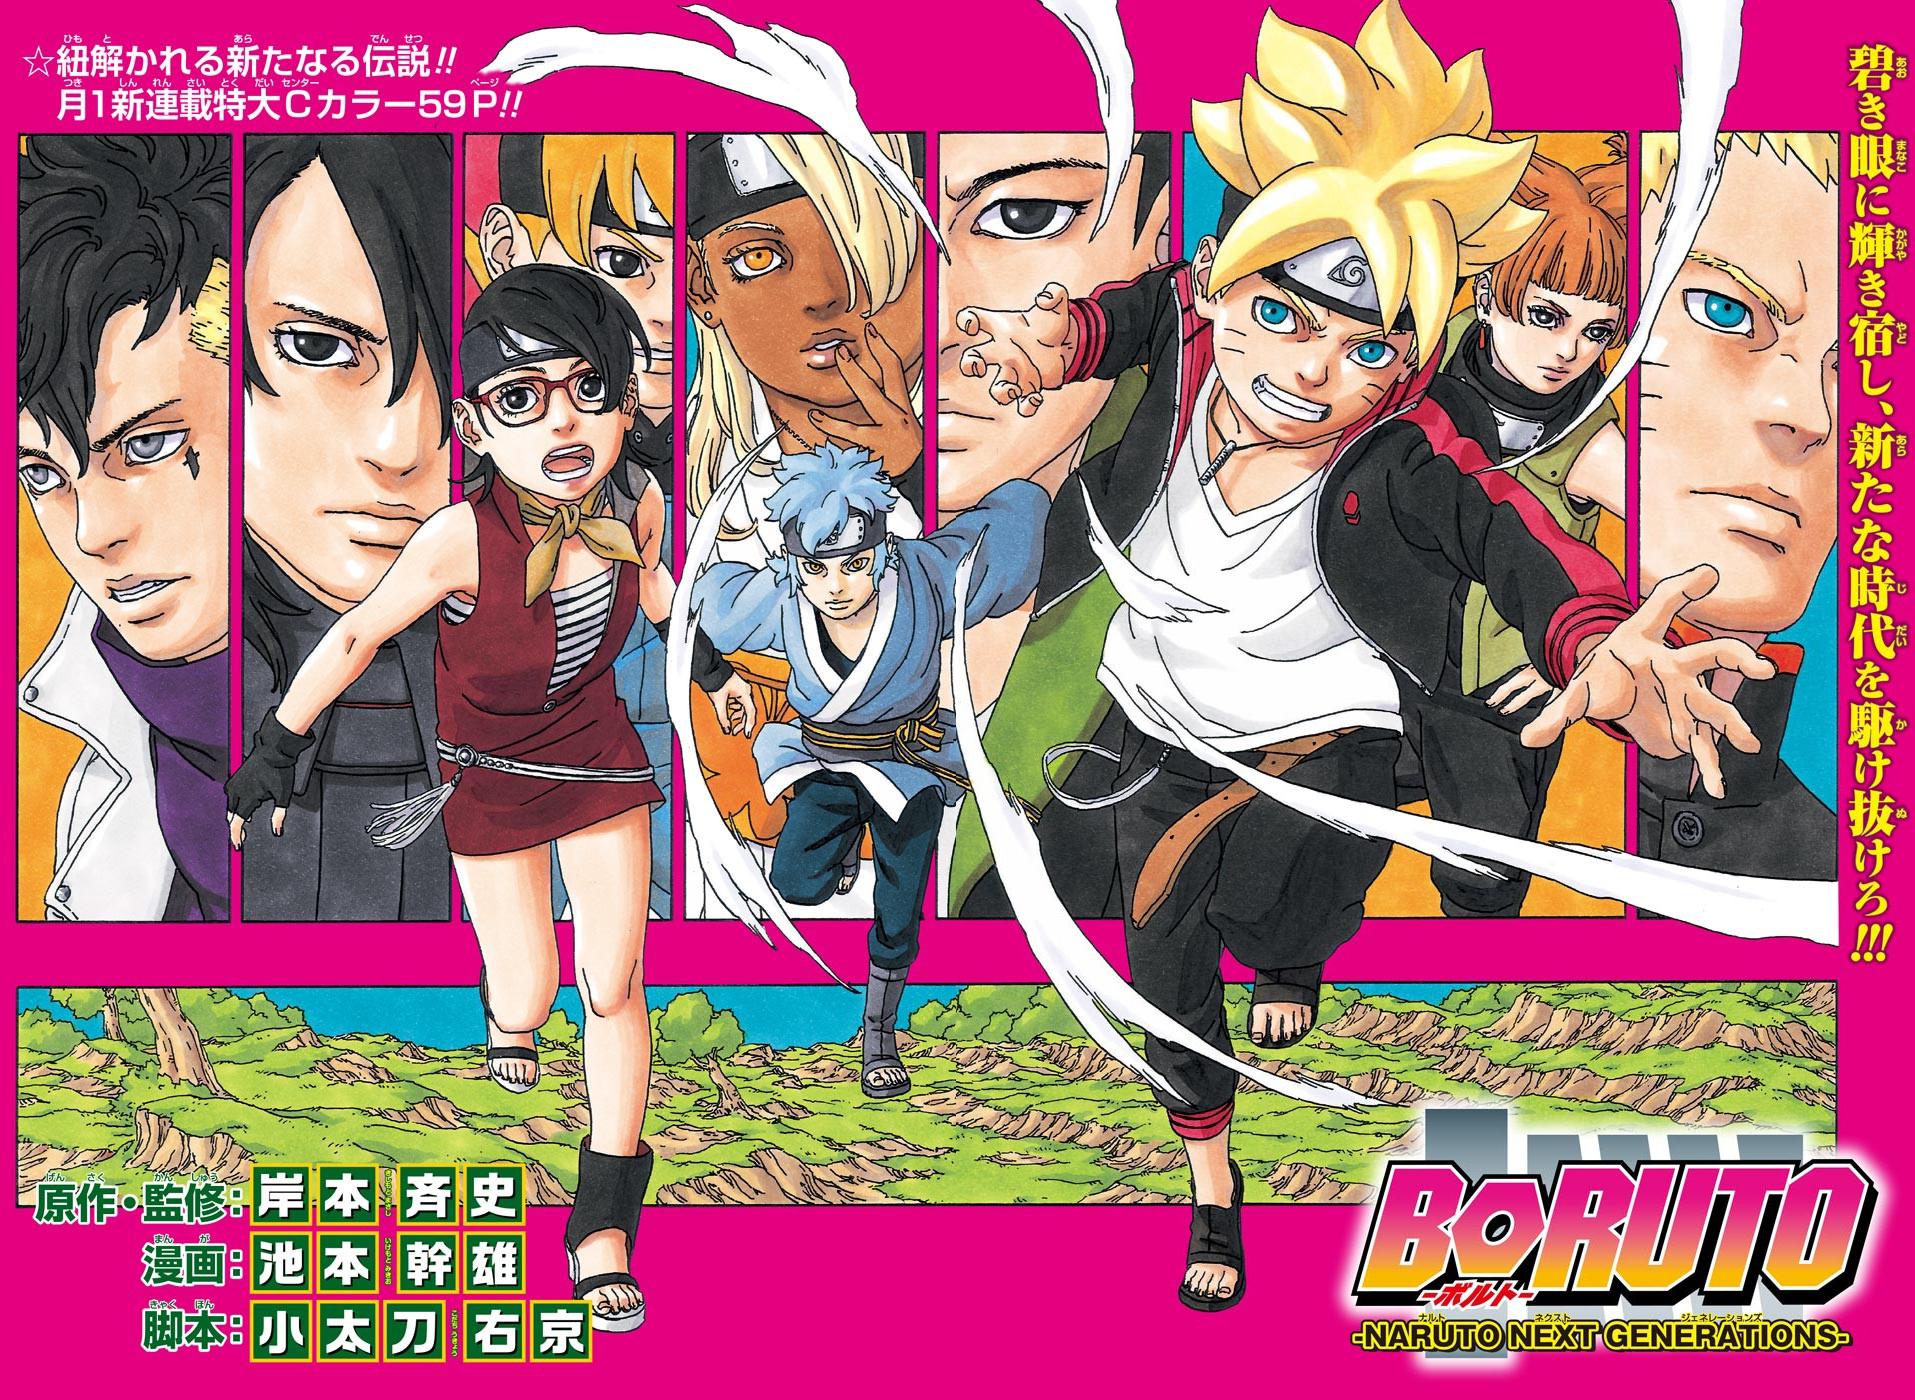 Boruto Uzumaki!! | Narutopedia | Fandom powered by Wikia